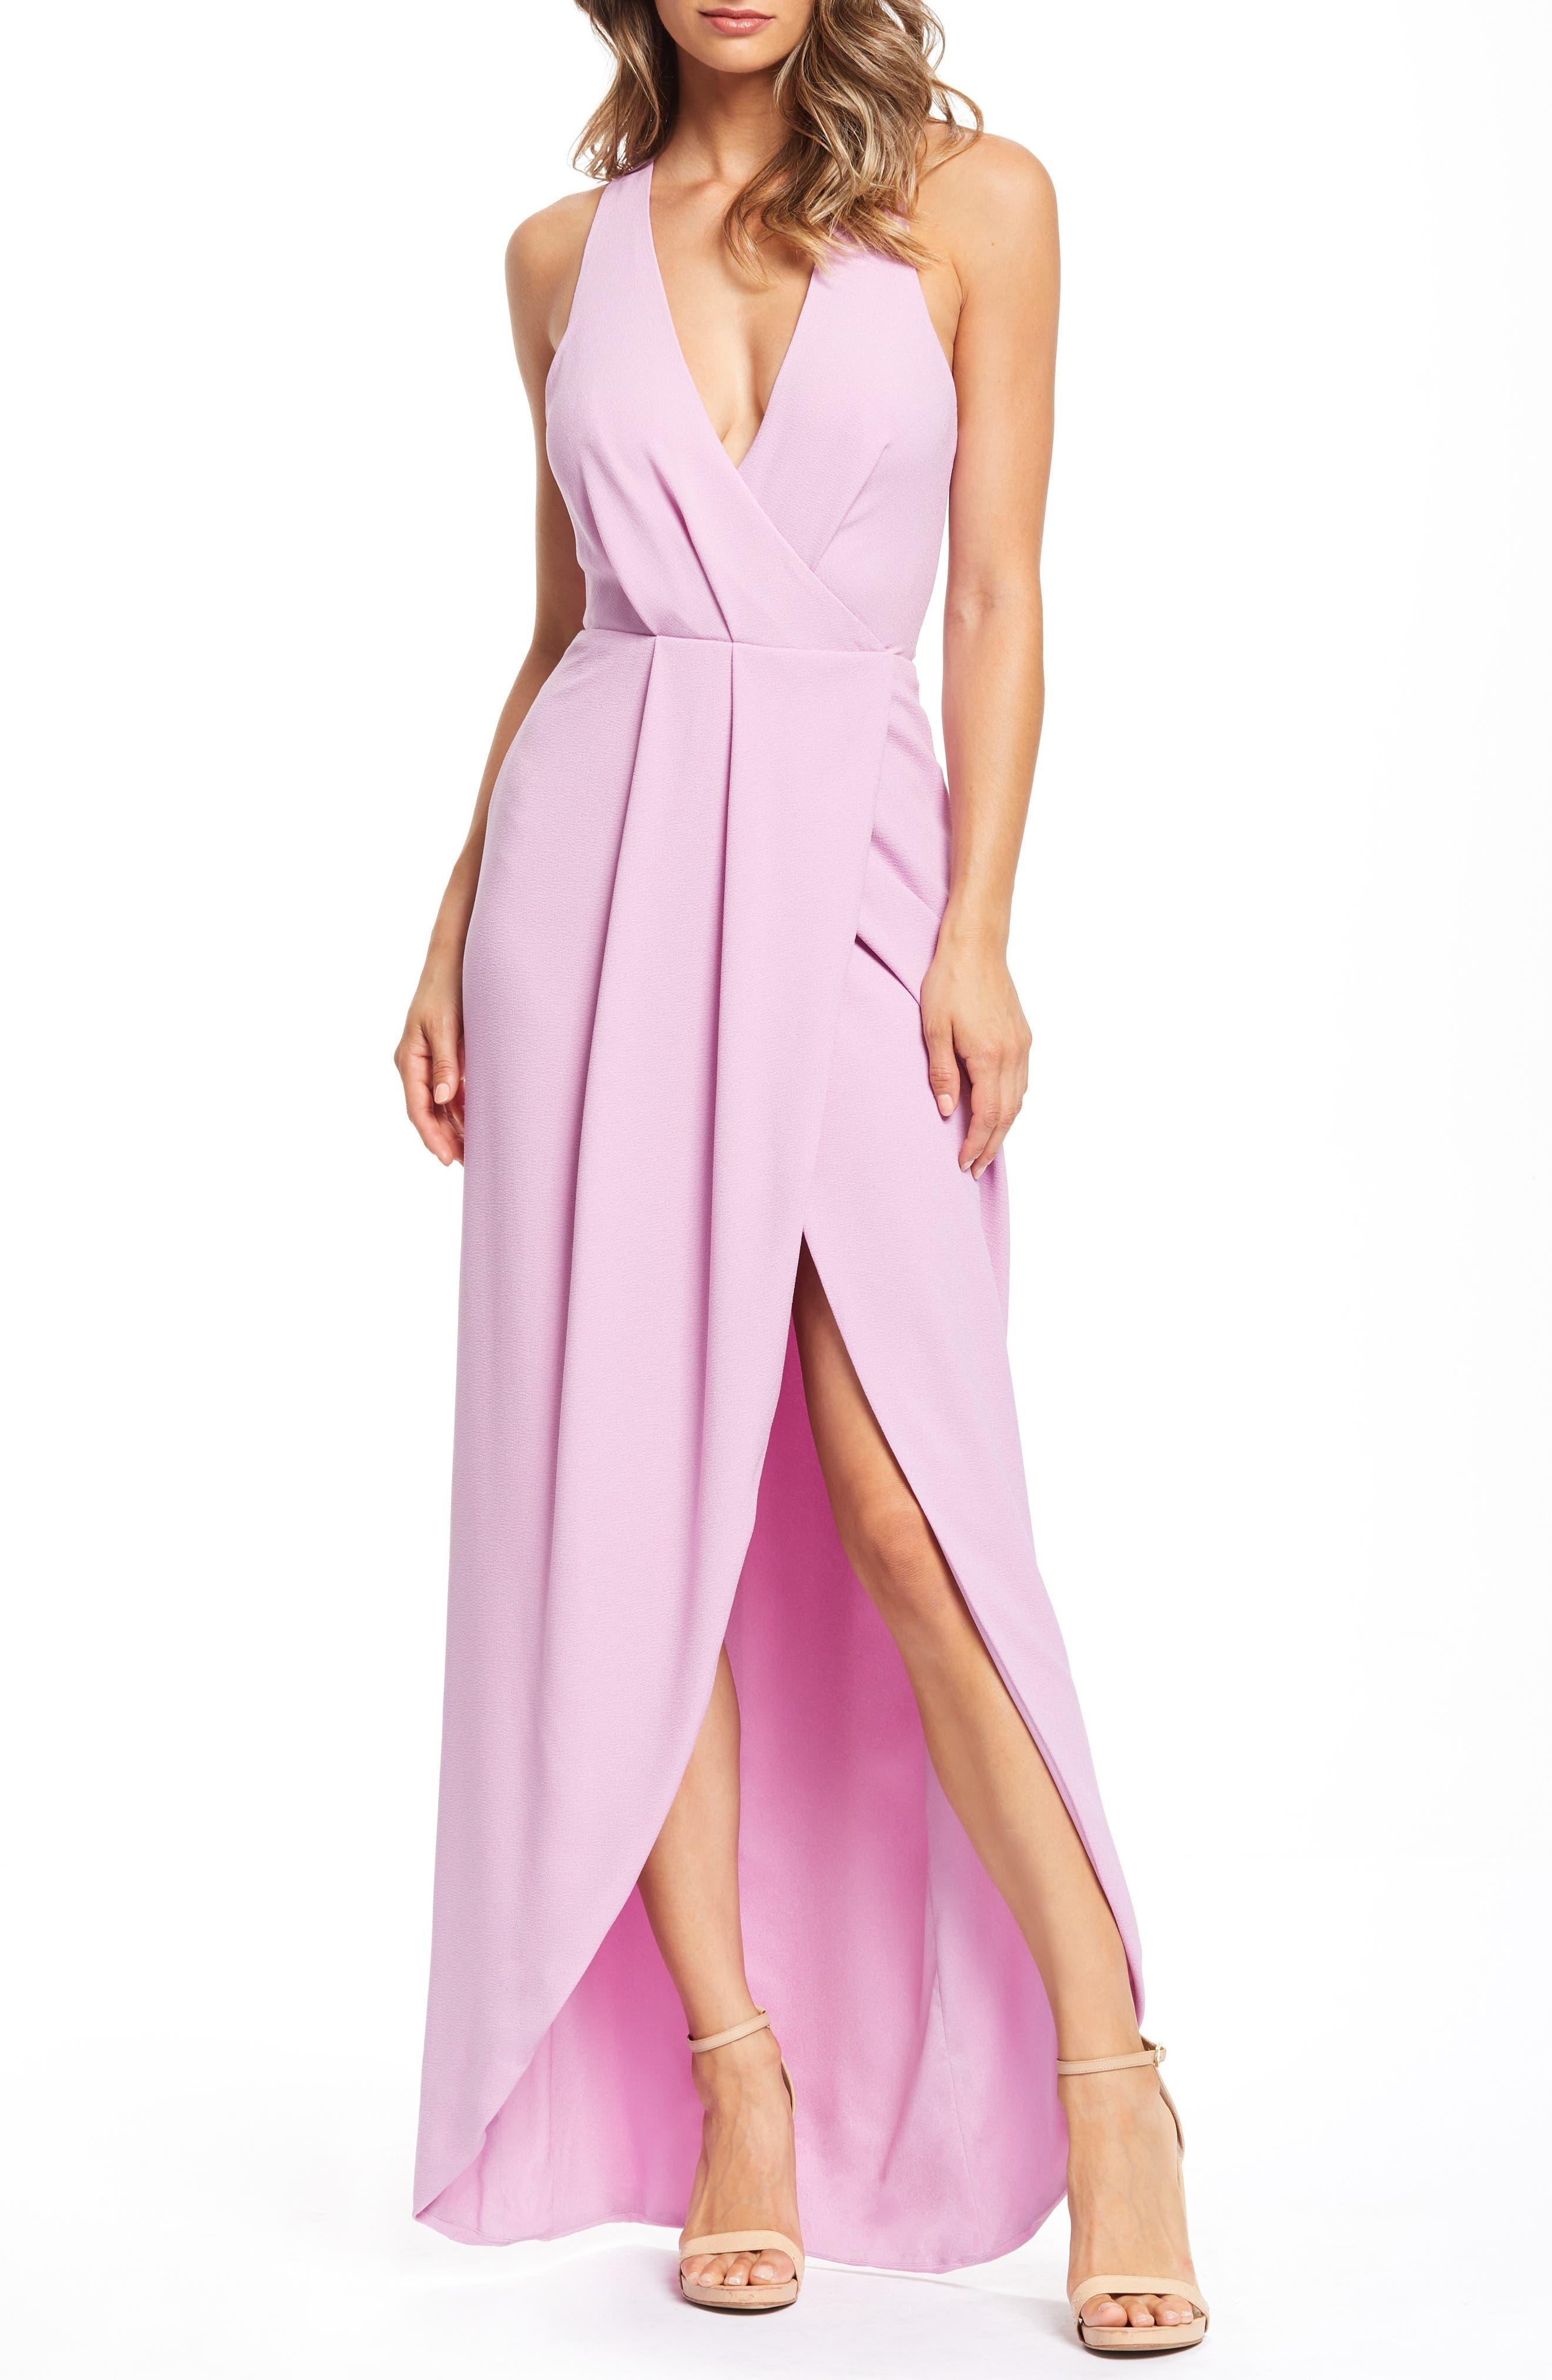 Dress The Population Ariel Racerback Faux Wrap Evening Dress, Purple